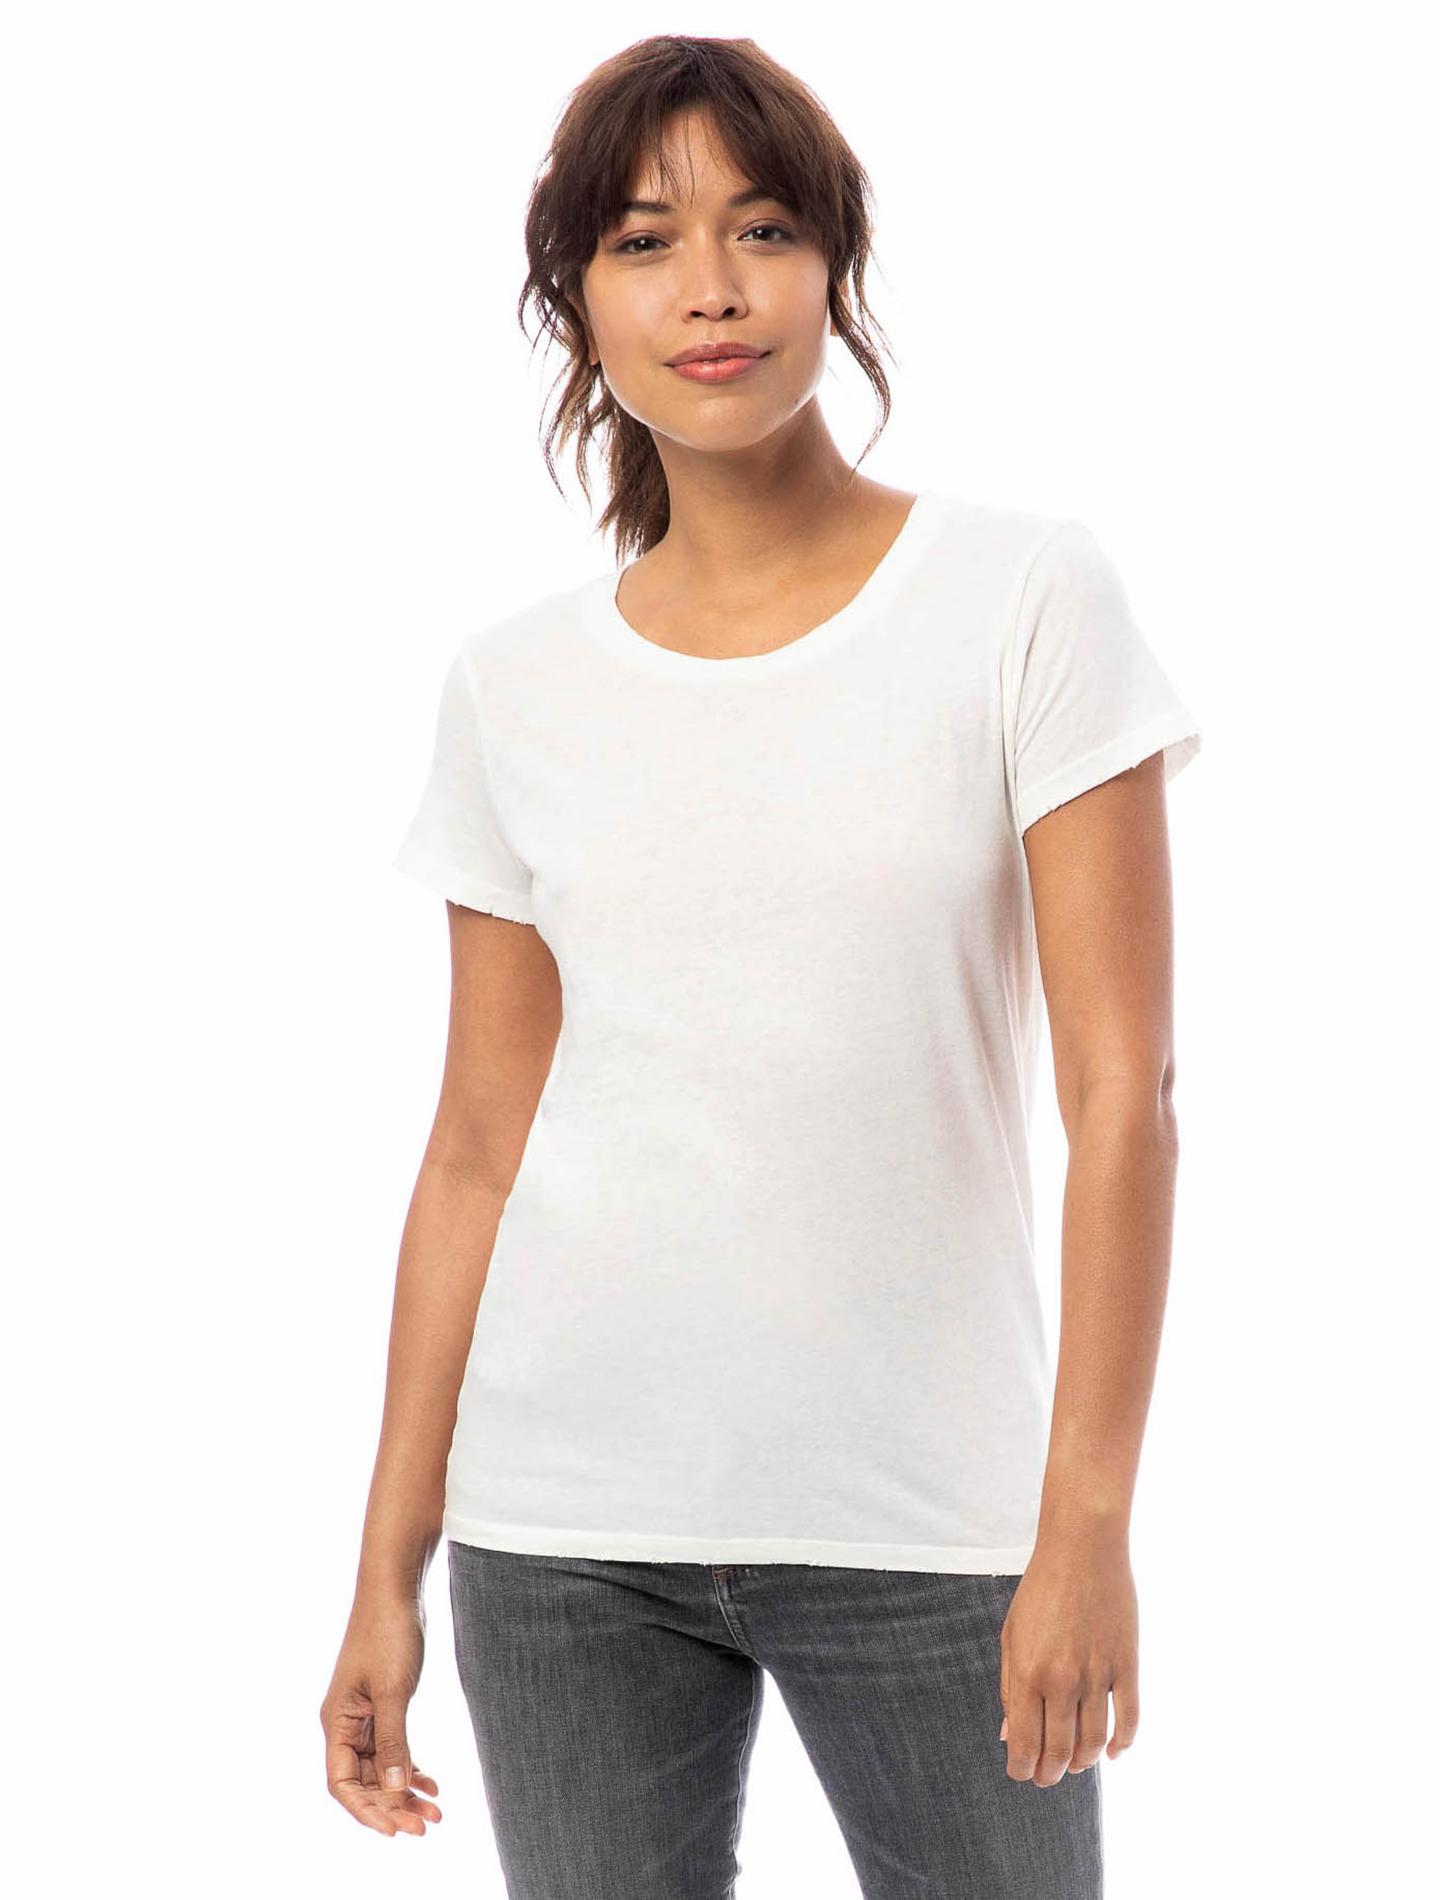 Vintage Garment Dyed Distressed T-Shirt